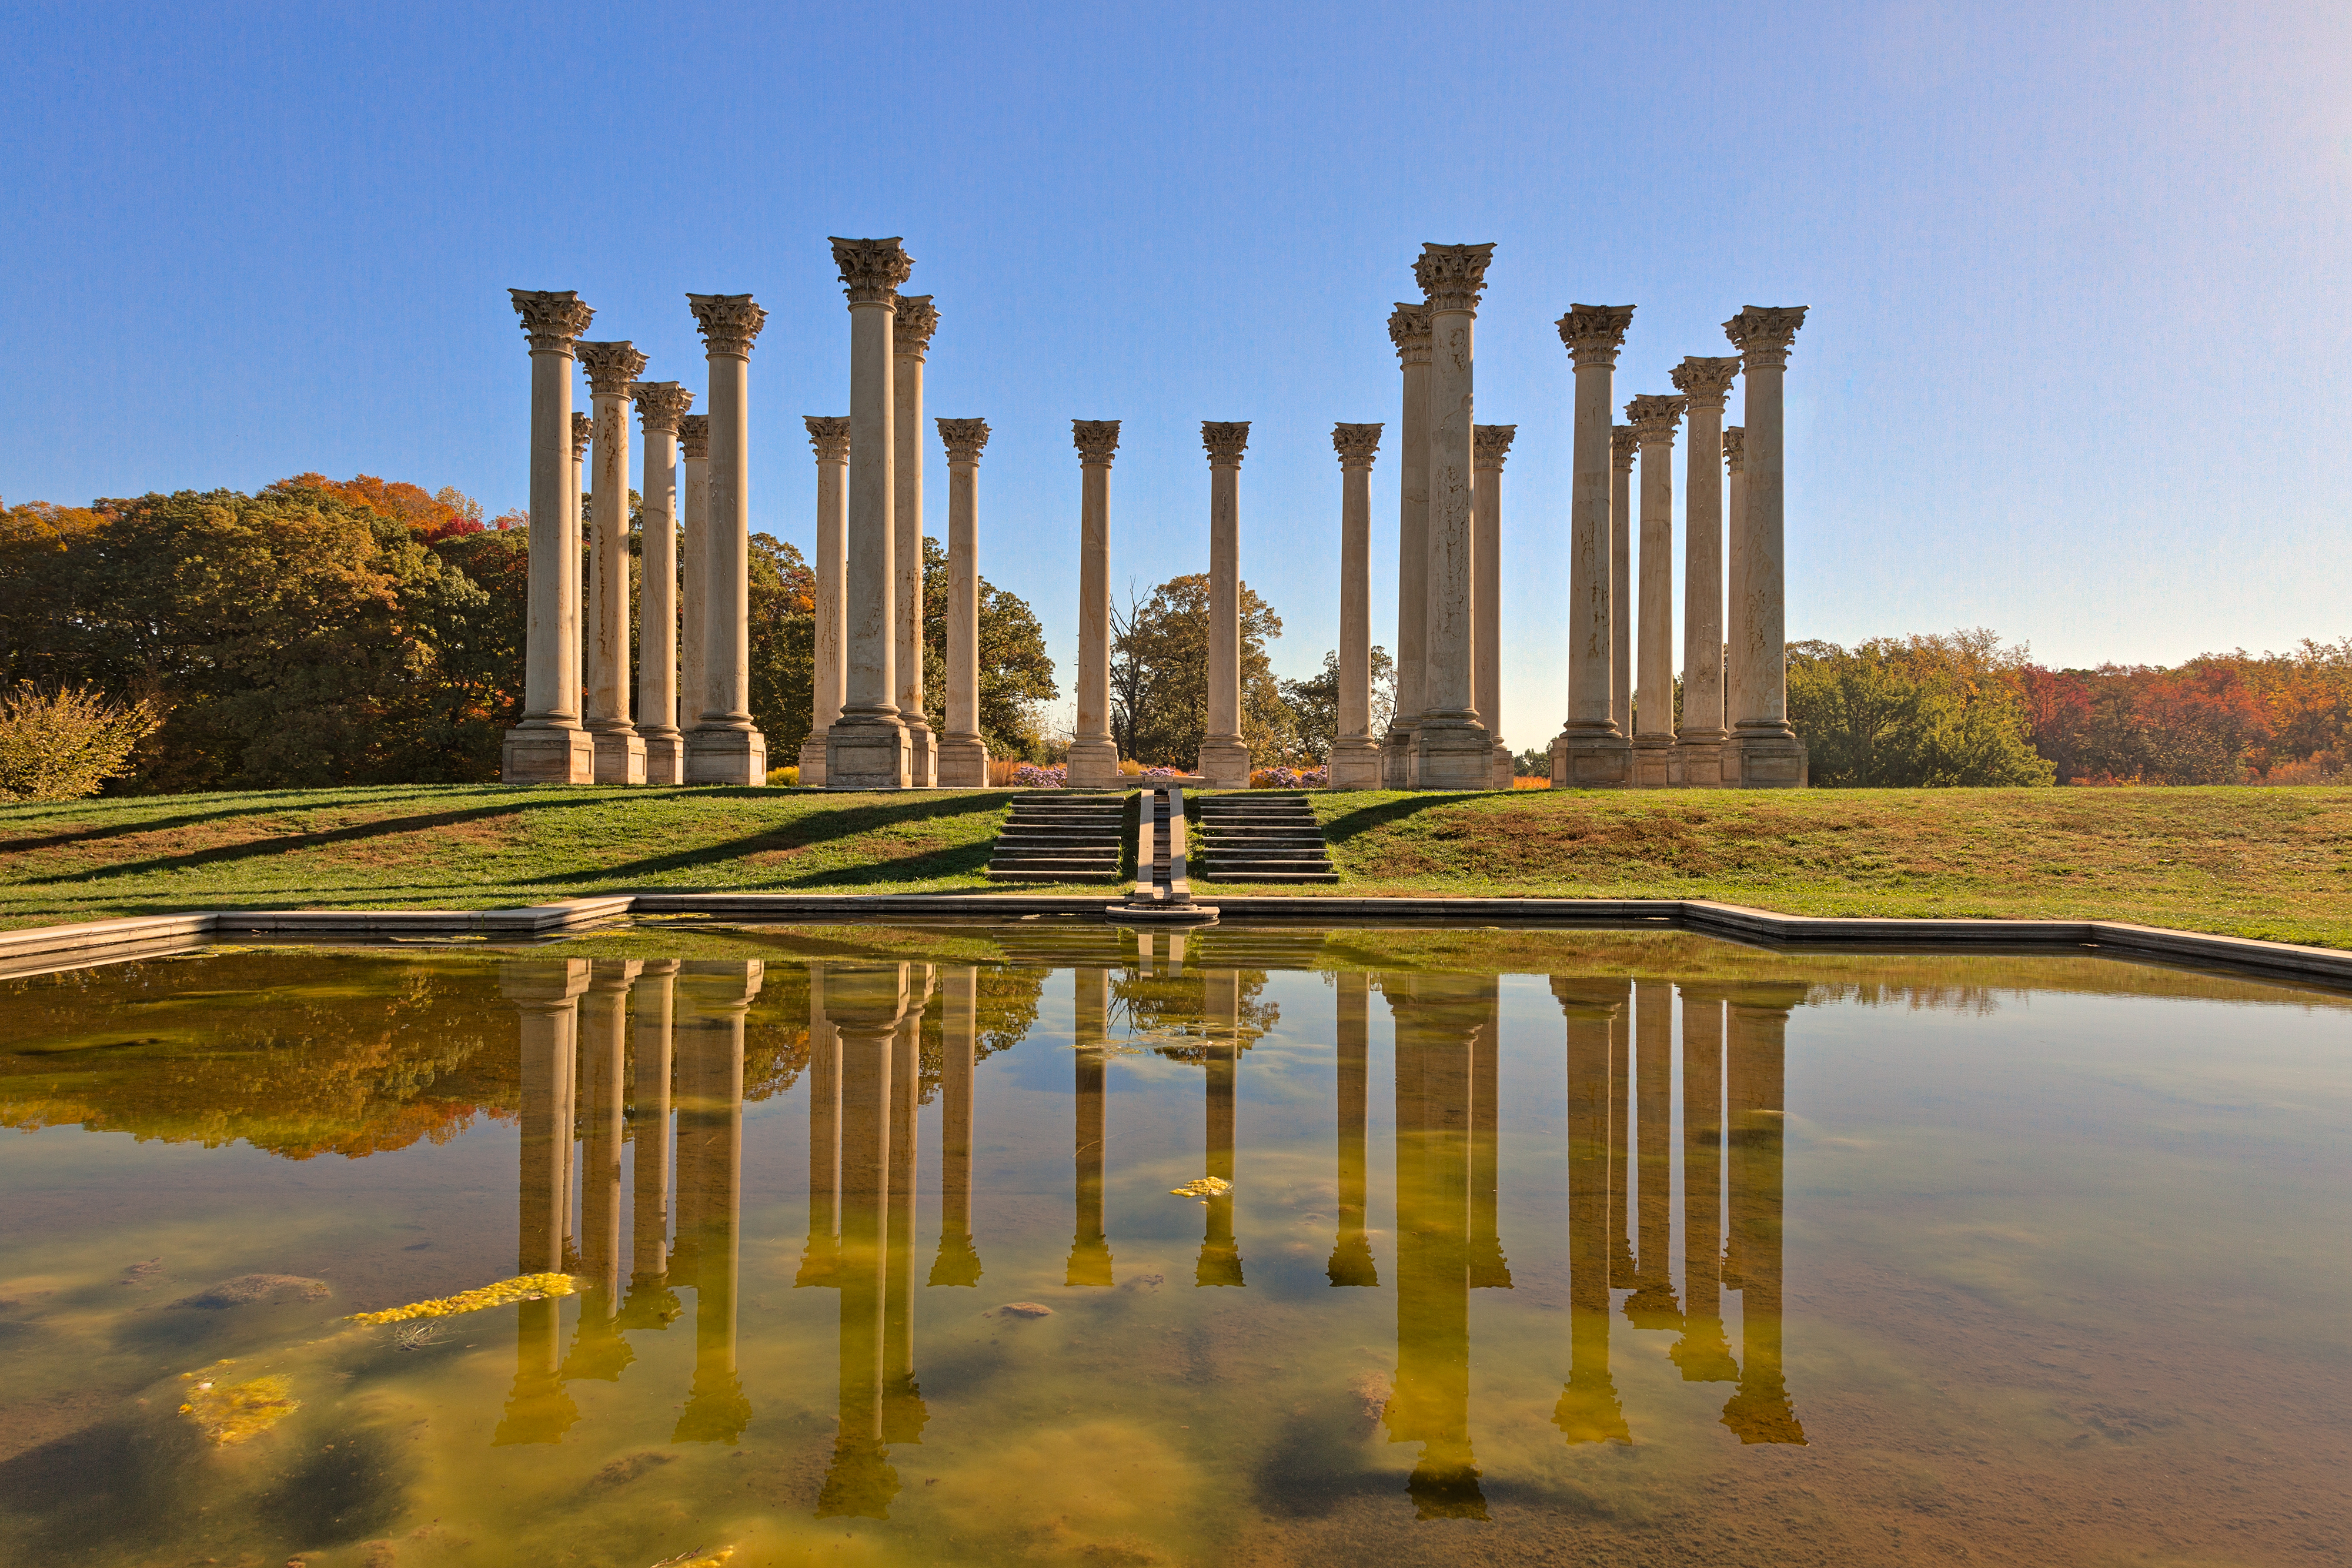 Capitol Arboretum Columns Iii Freebie By Somadjinn On